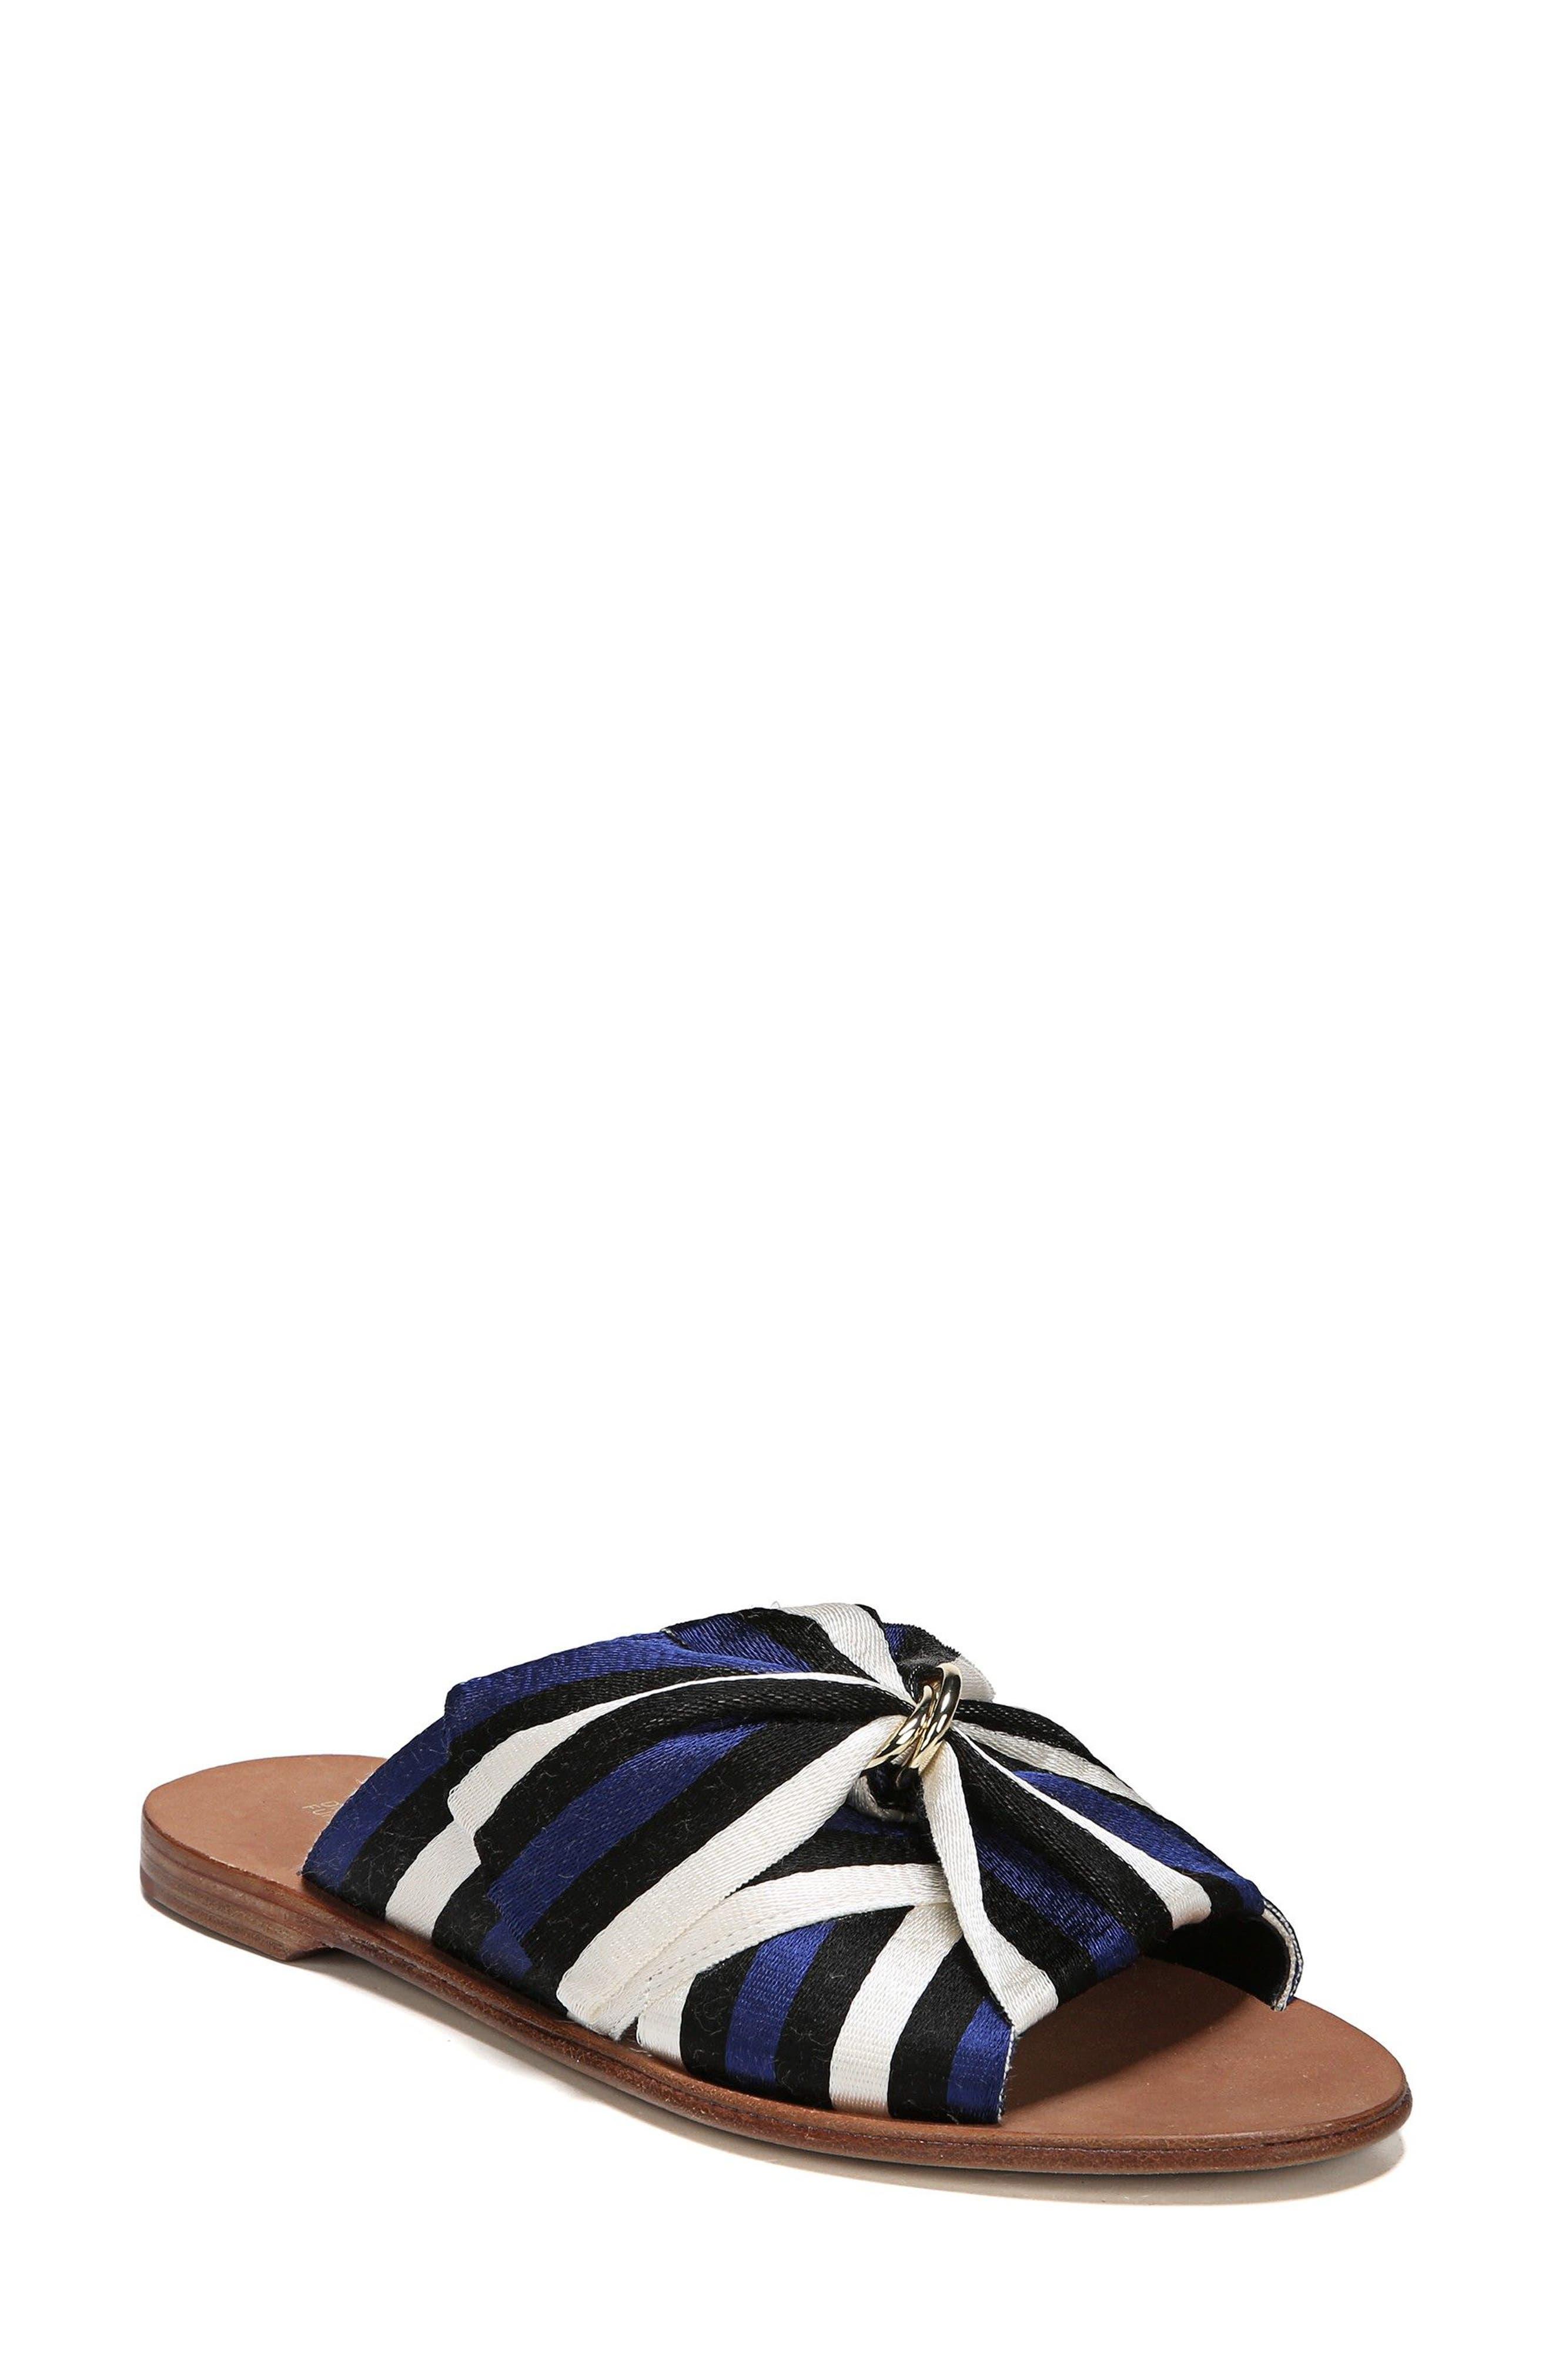 Bella Asymmetrical Slide Sandal,                             Main thumbnail 1, color,